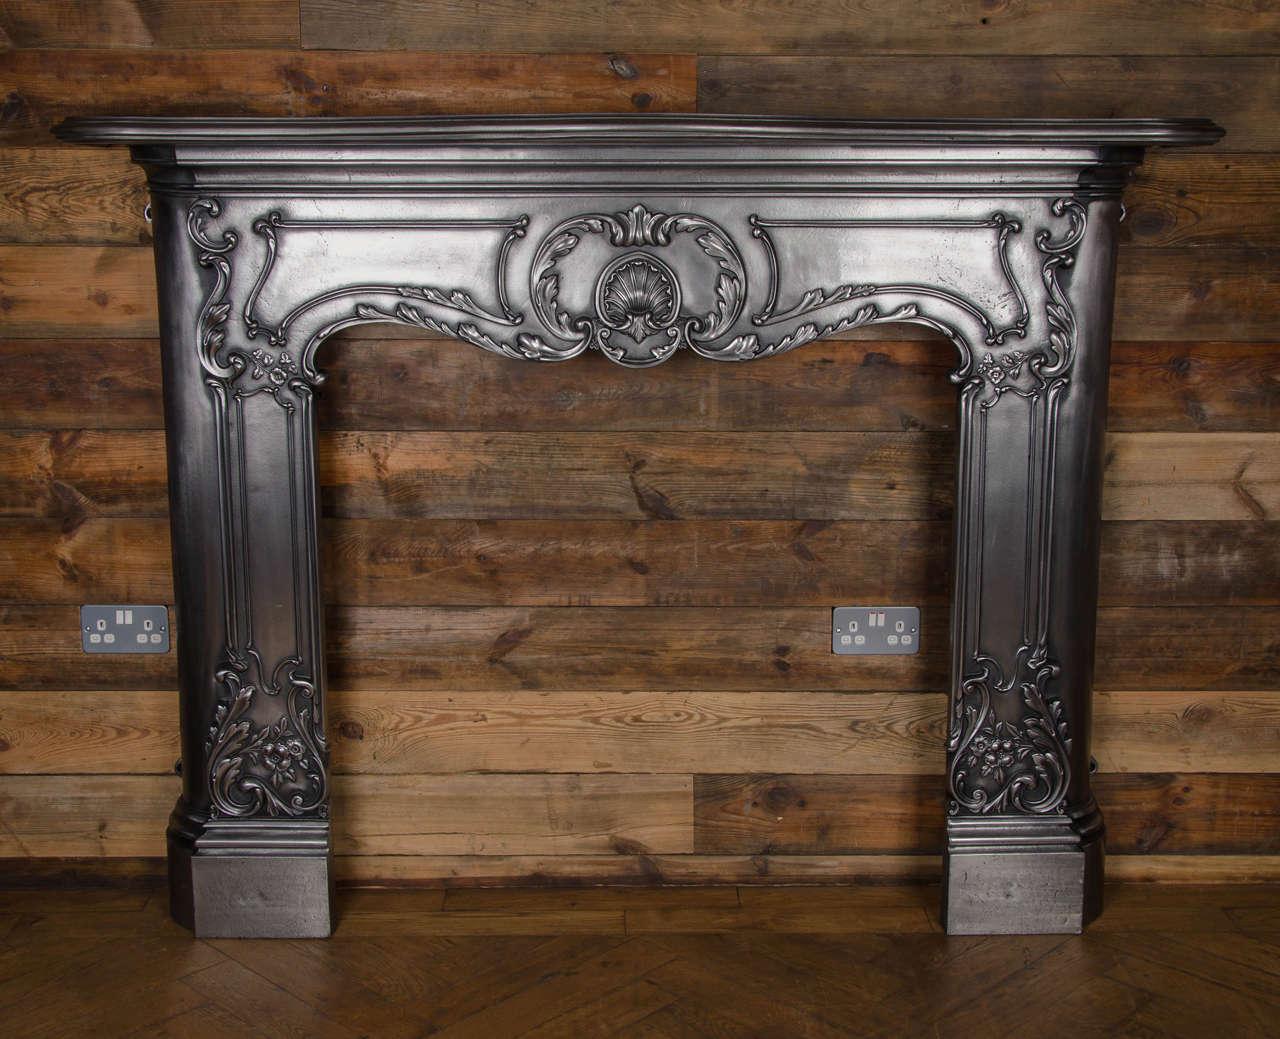 Louis Xv Style Polished Cast Iron Fireplace Surround At